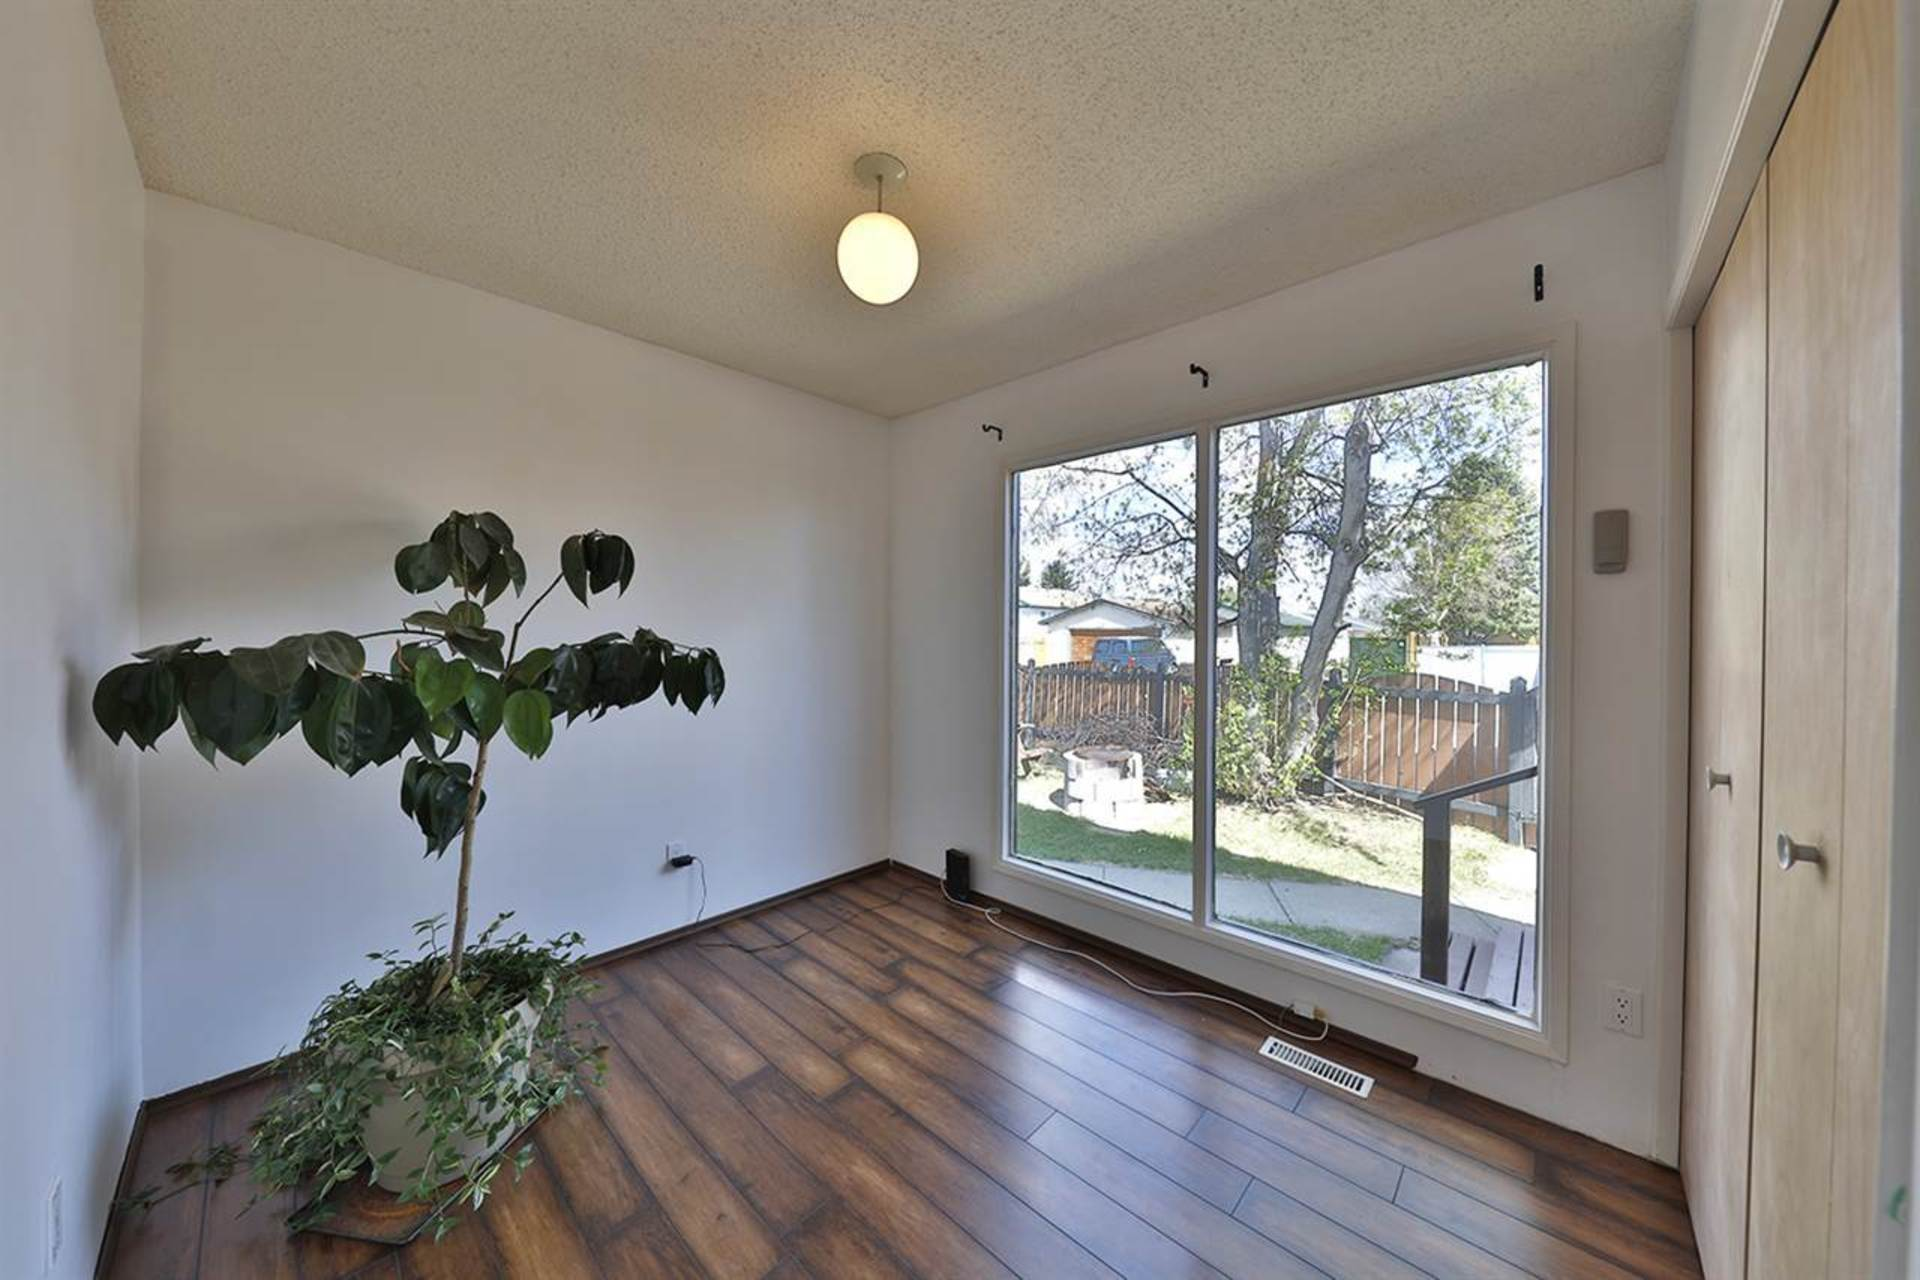 14111-117-street-carlisle-edmonton-10 at 14111 117 Street, Carlisle, Edmonton